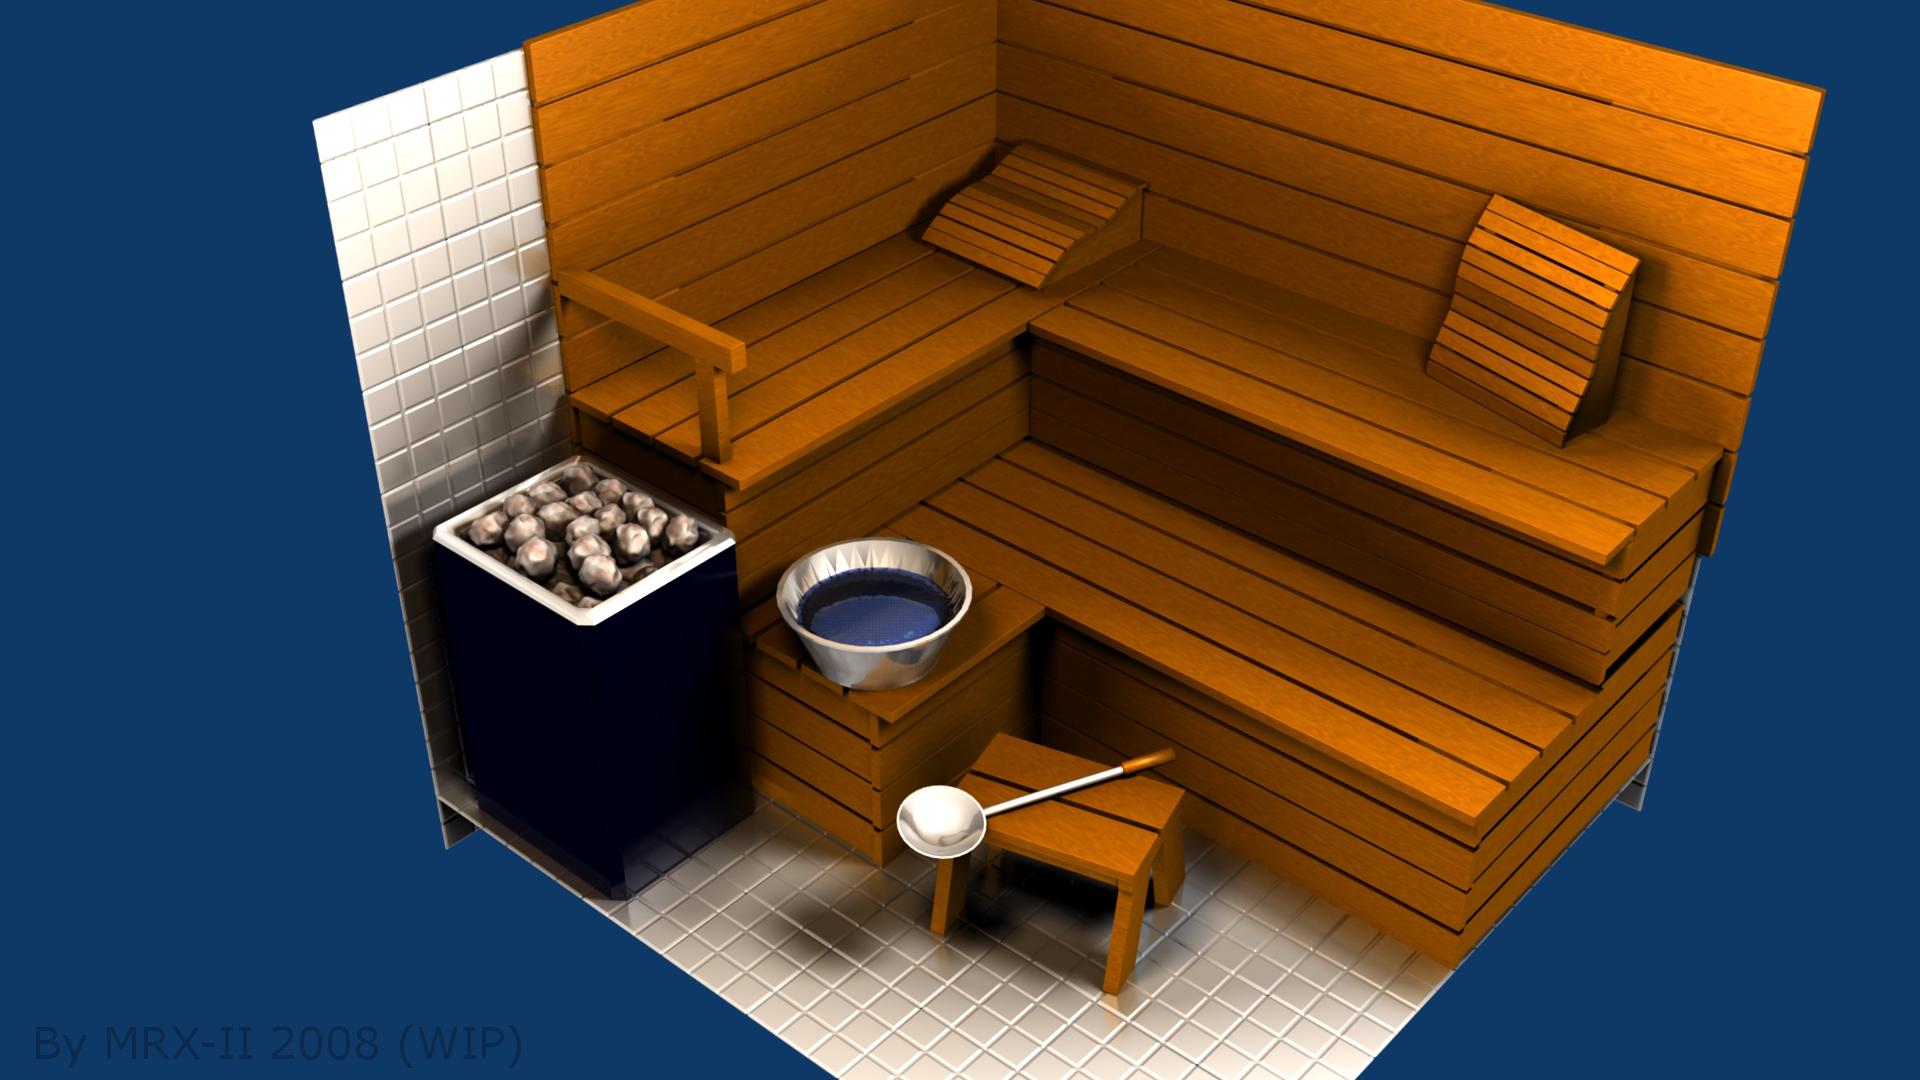 sauna 3d wip 2 by mrx ii on deviantart